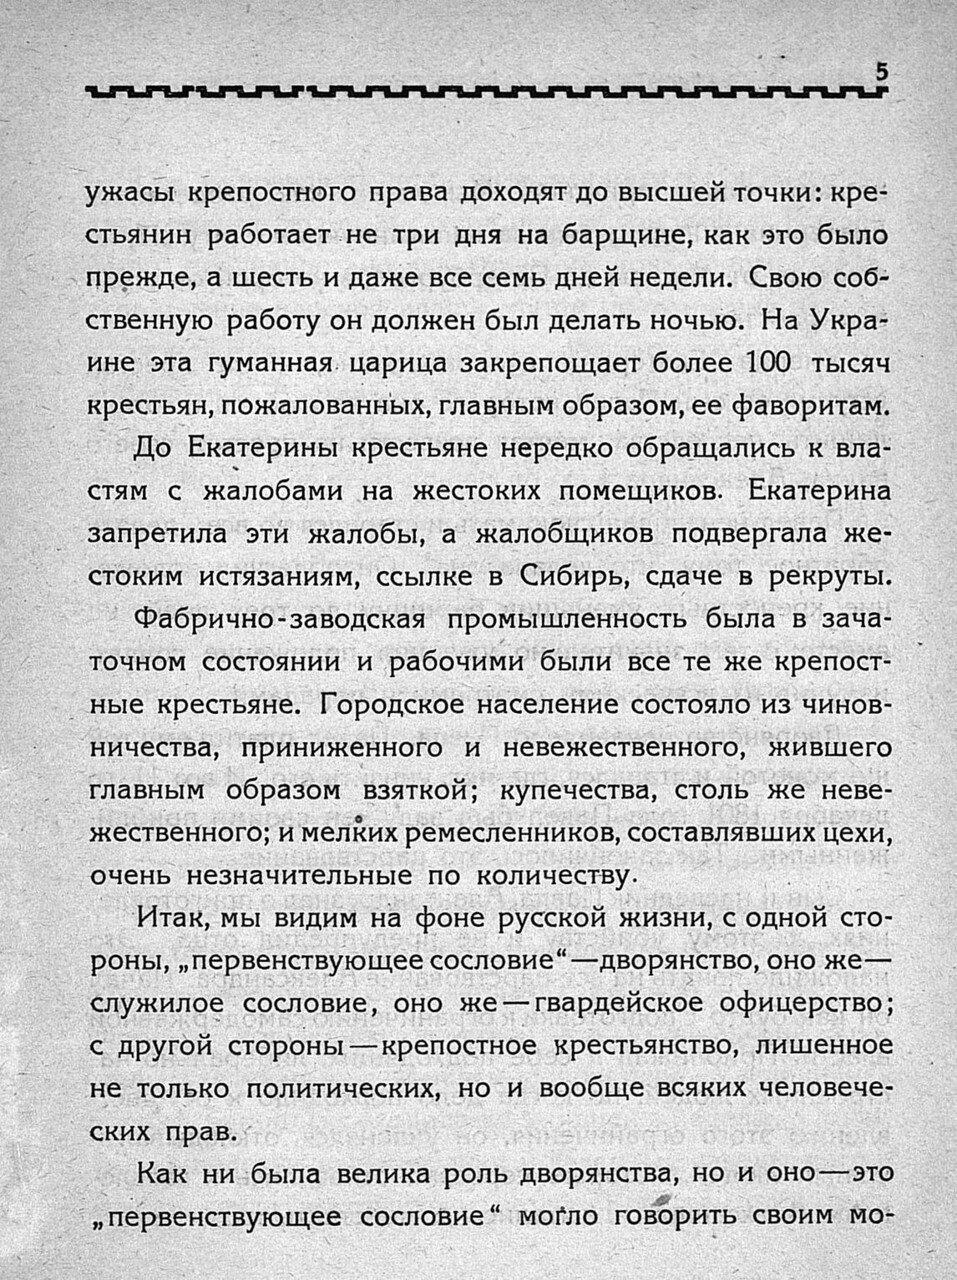 https://img-fotki.yandex.ru/get/26767/199368979.23/0_1bfac9_7d2ea209_XXXL.jpg